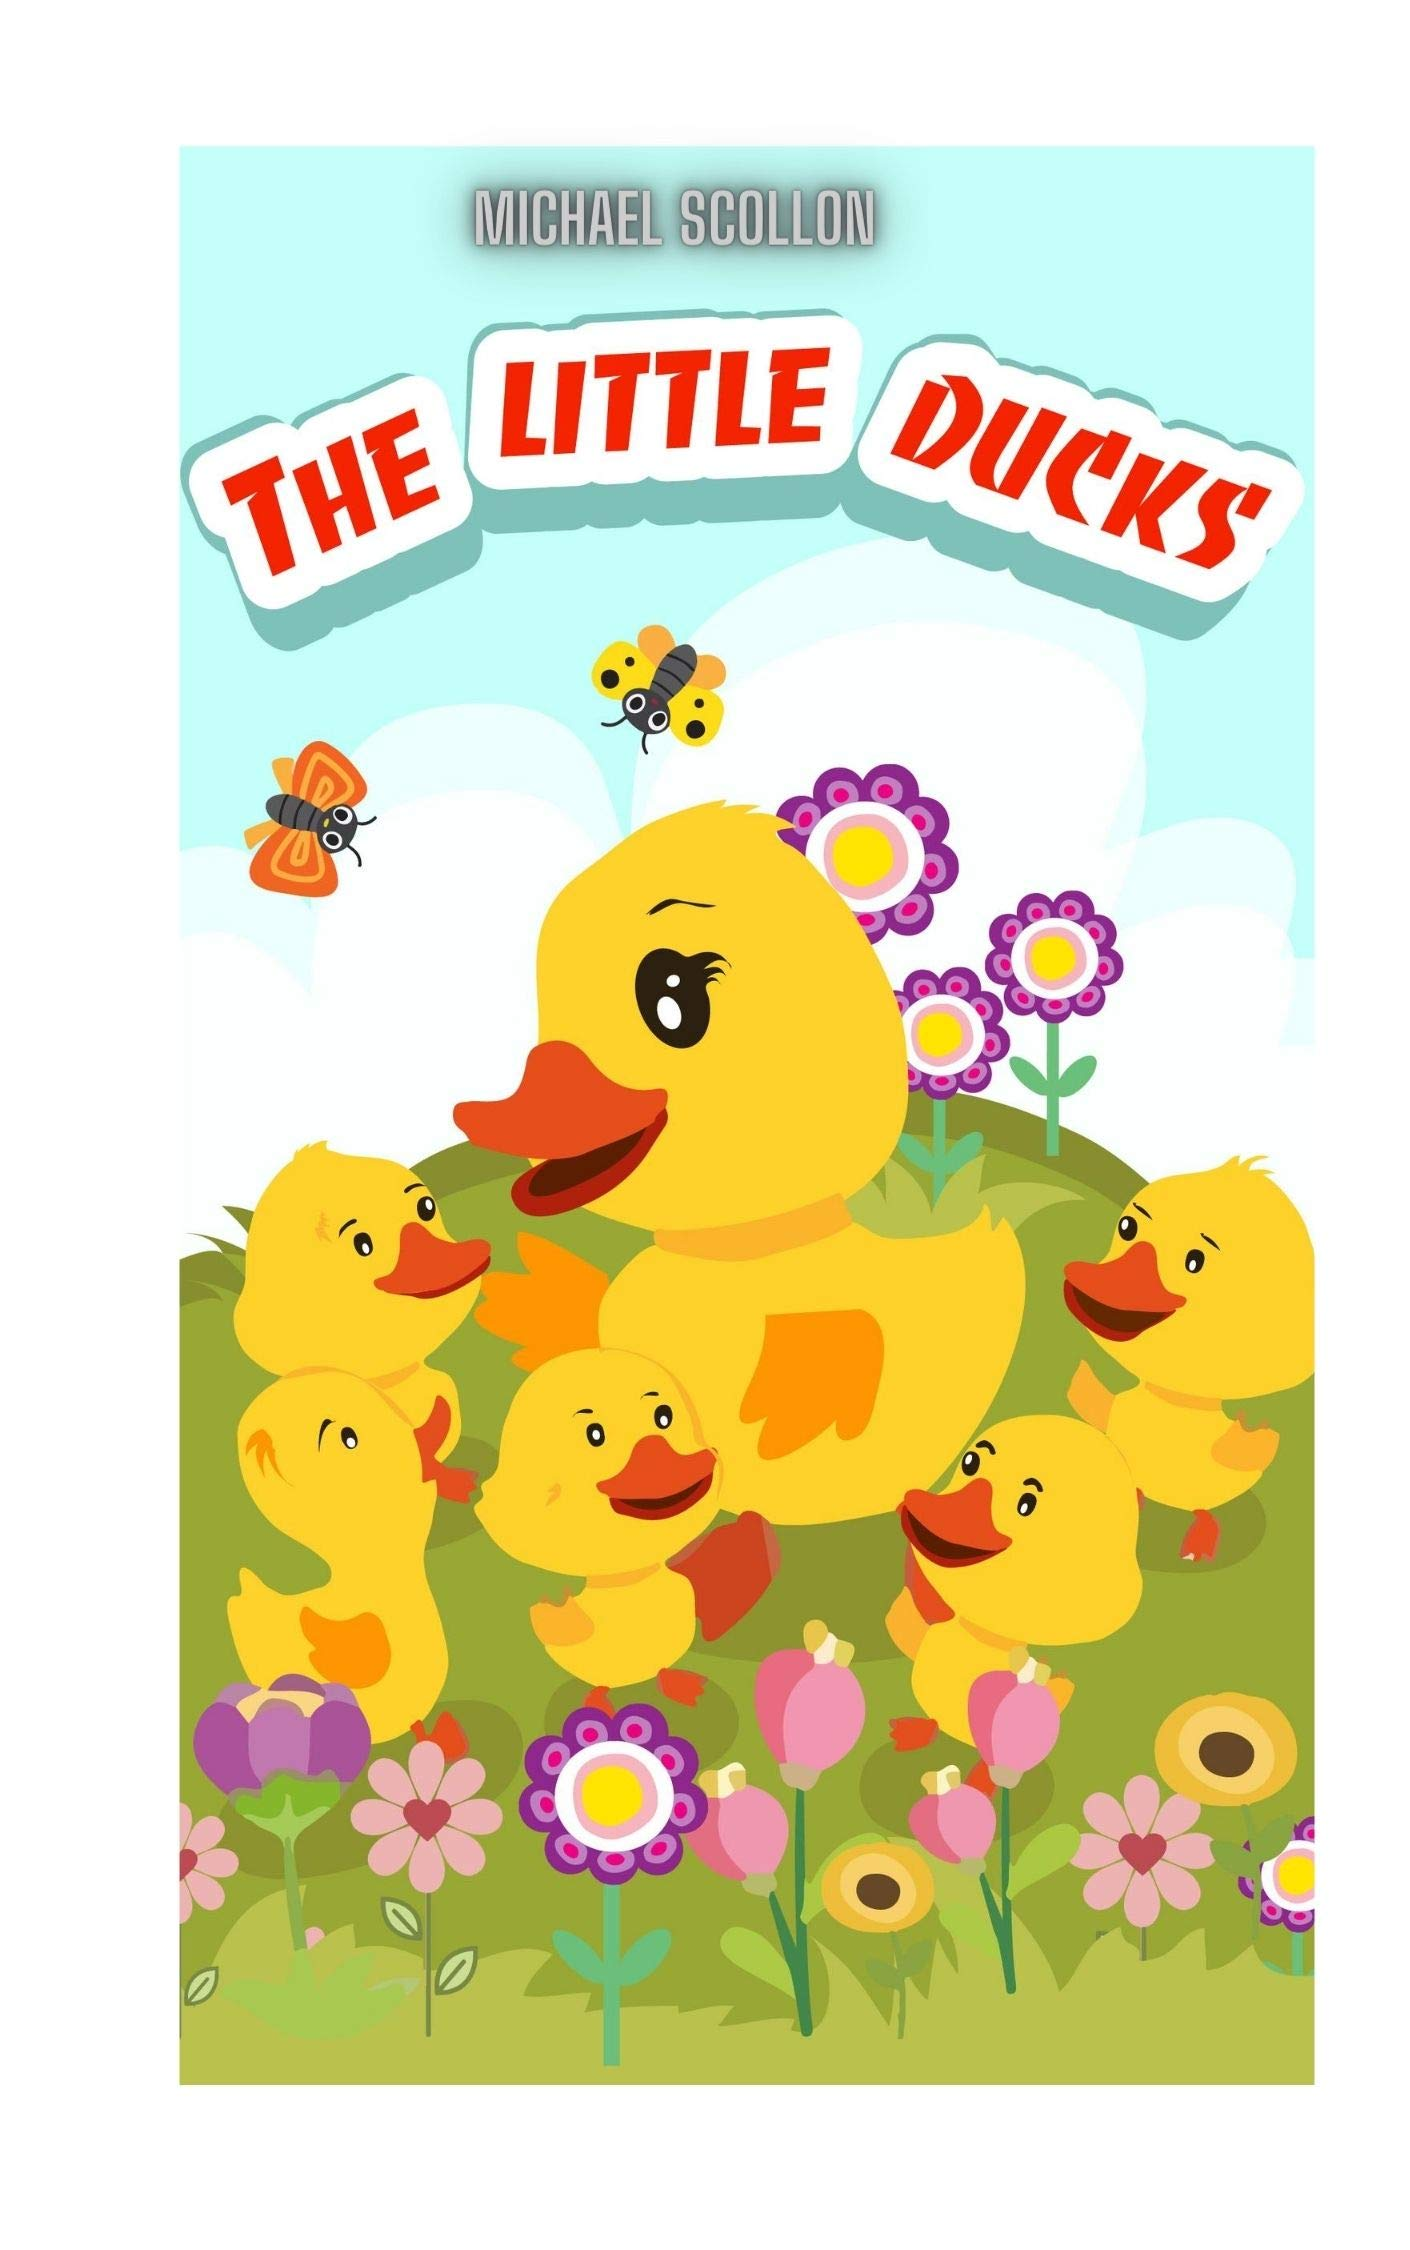 Books for kids: The little ducks: Free Stories For Kids Ages 2-8 (Kids Books Children's Books - Free Stories)